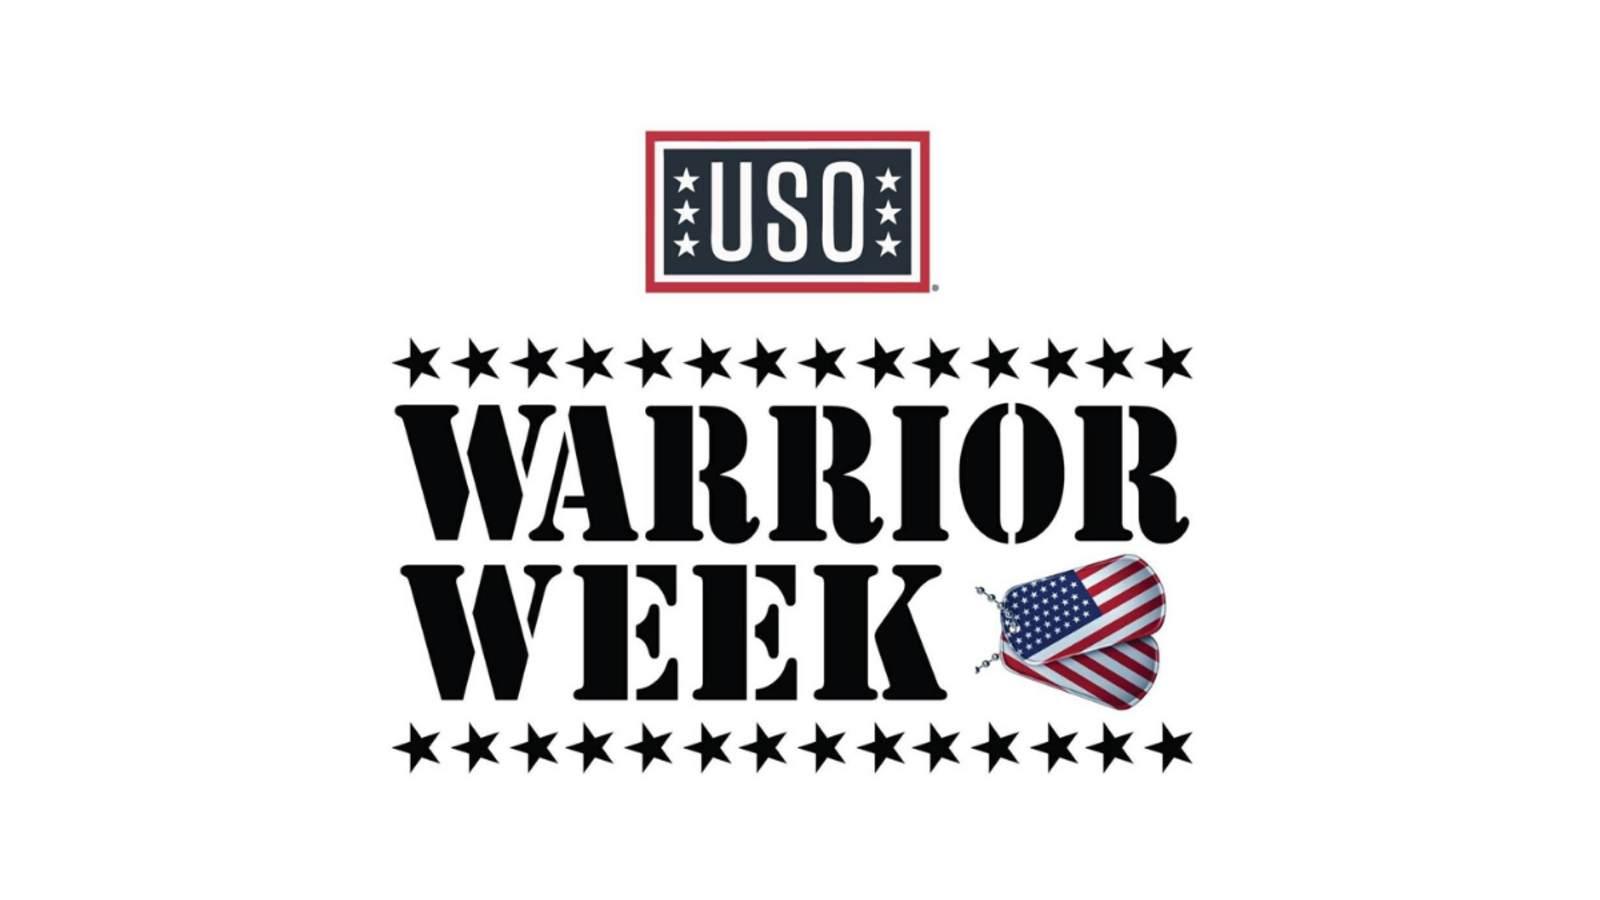 USO Esports Tournament at Las Vegas Warrior Week November 12th-15th